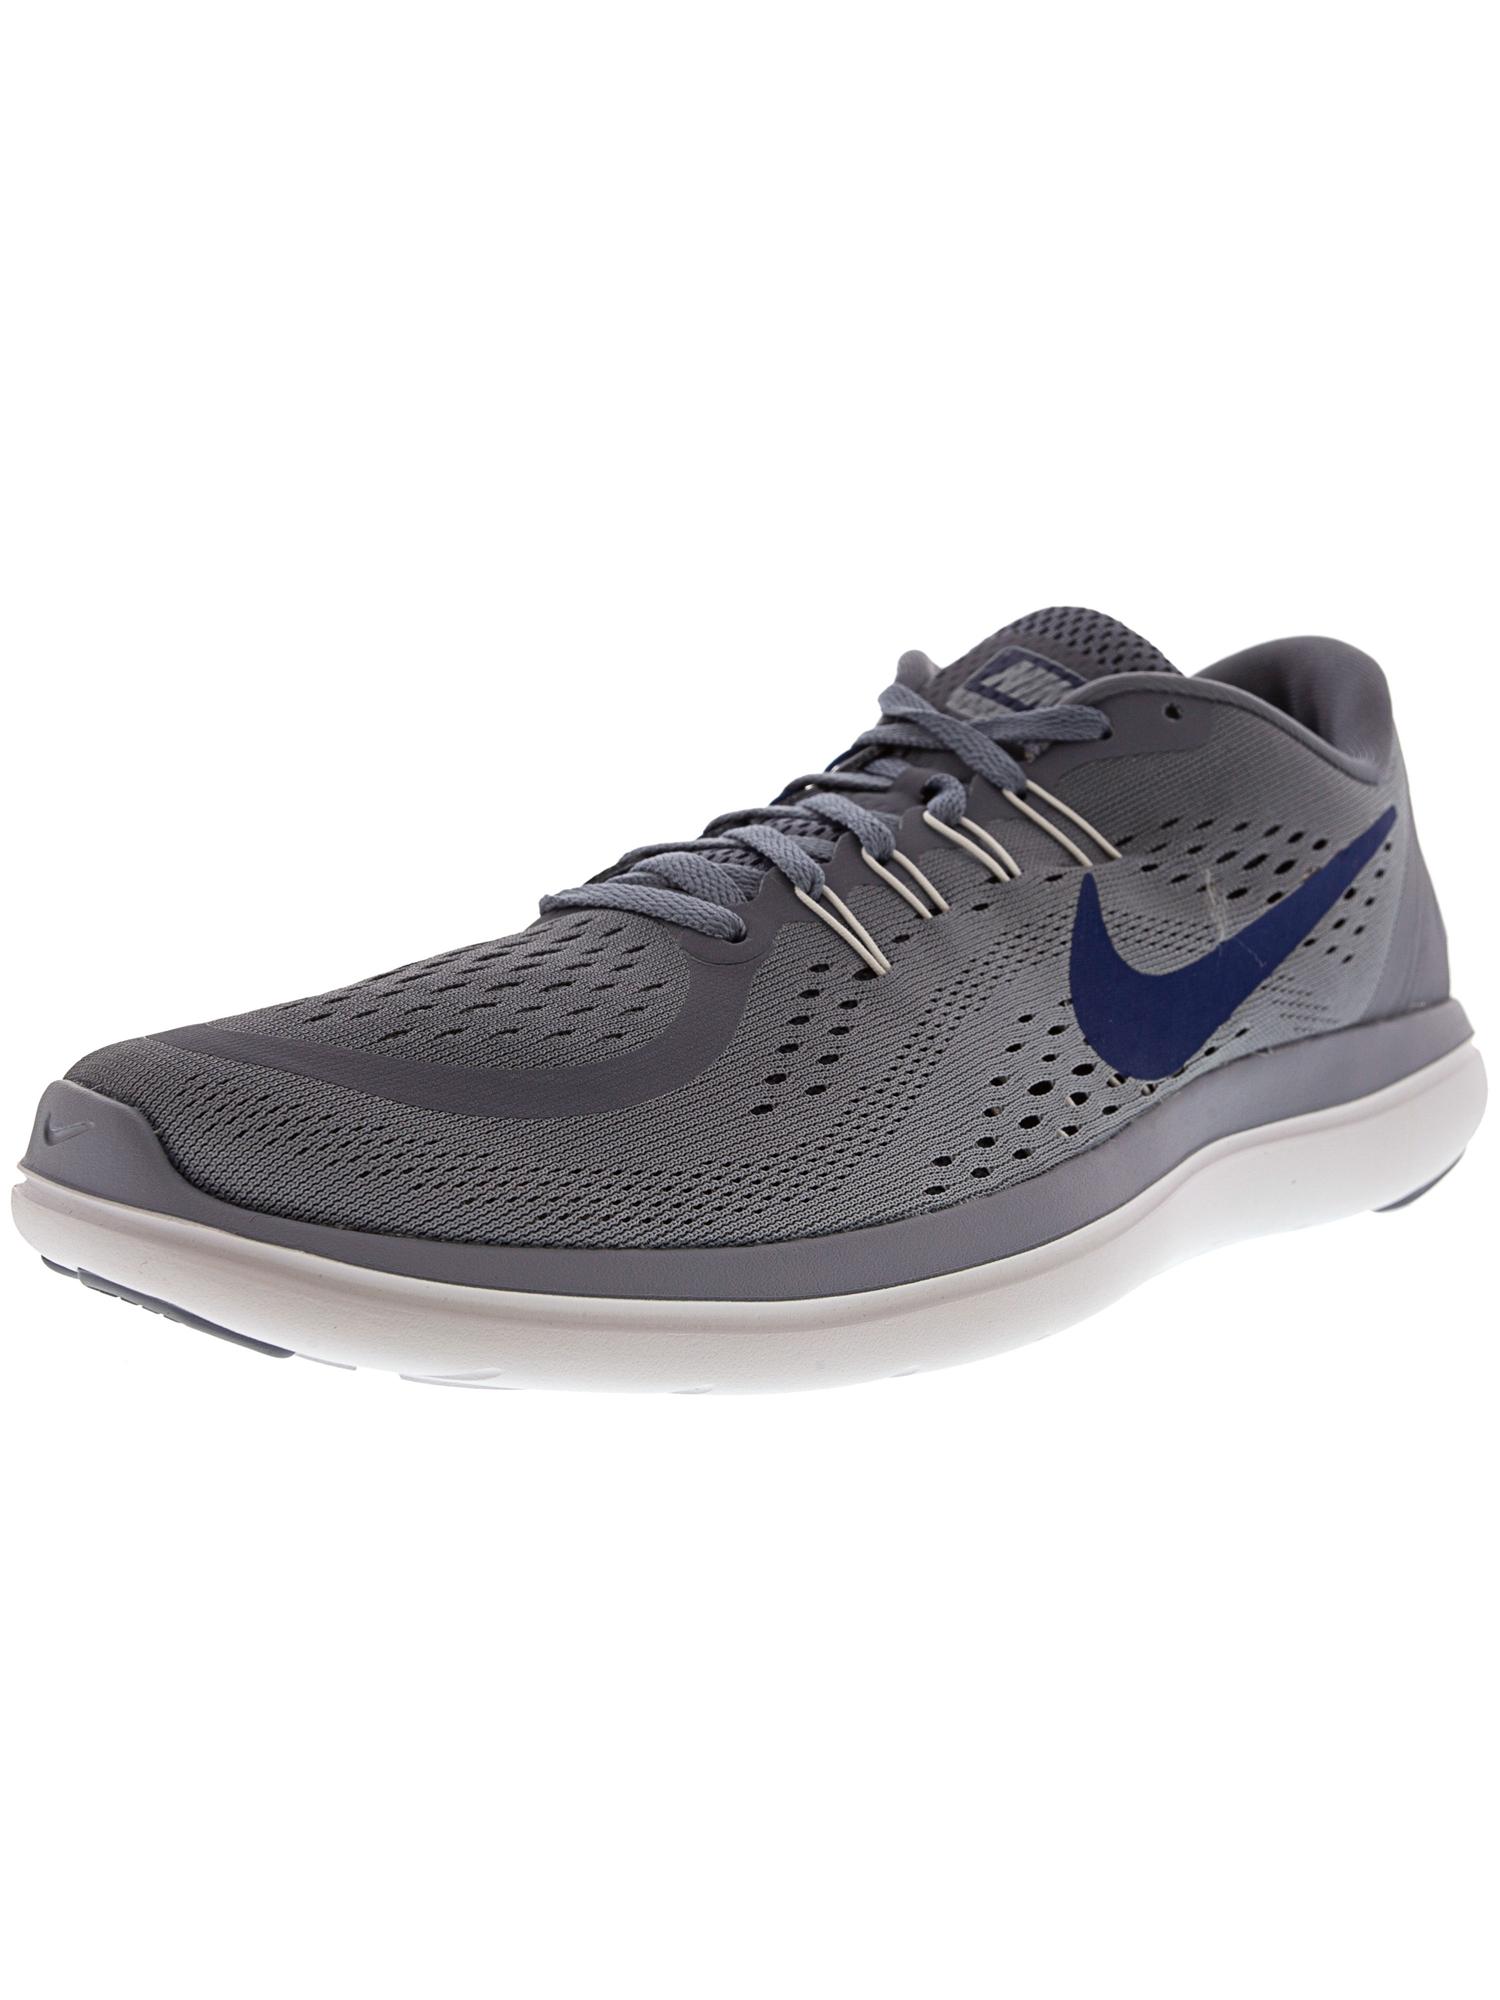 Nike Men's Flex 2017 Rn Black / Metallic Hematite-Tough Red Ankle-High Running Shoe - 12M